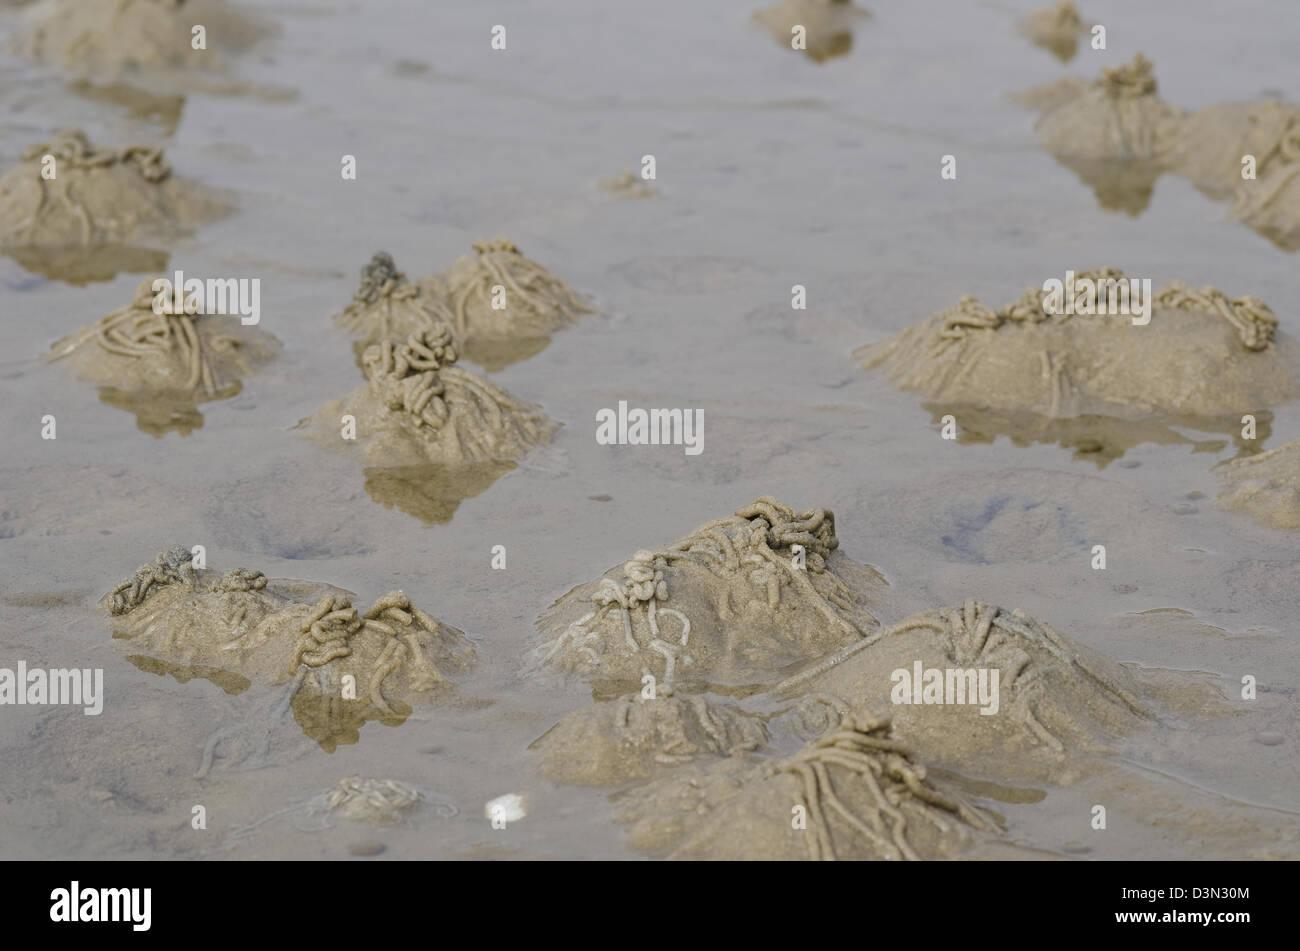 Burrows of the lugworm or sandworm, Arenicola marina, in the wadden sea - Stock Image